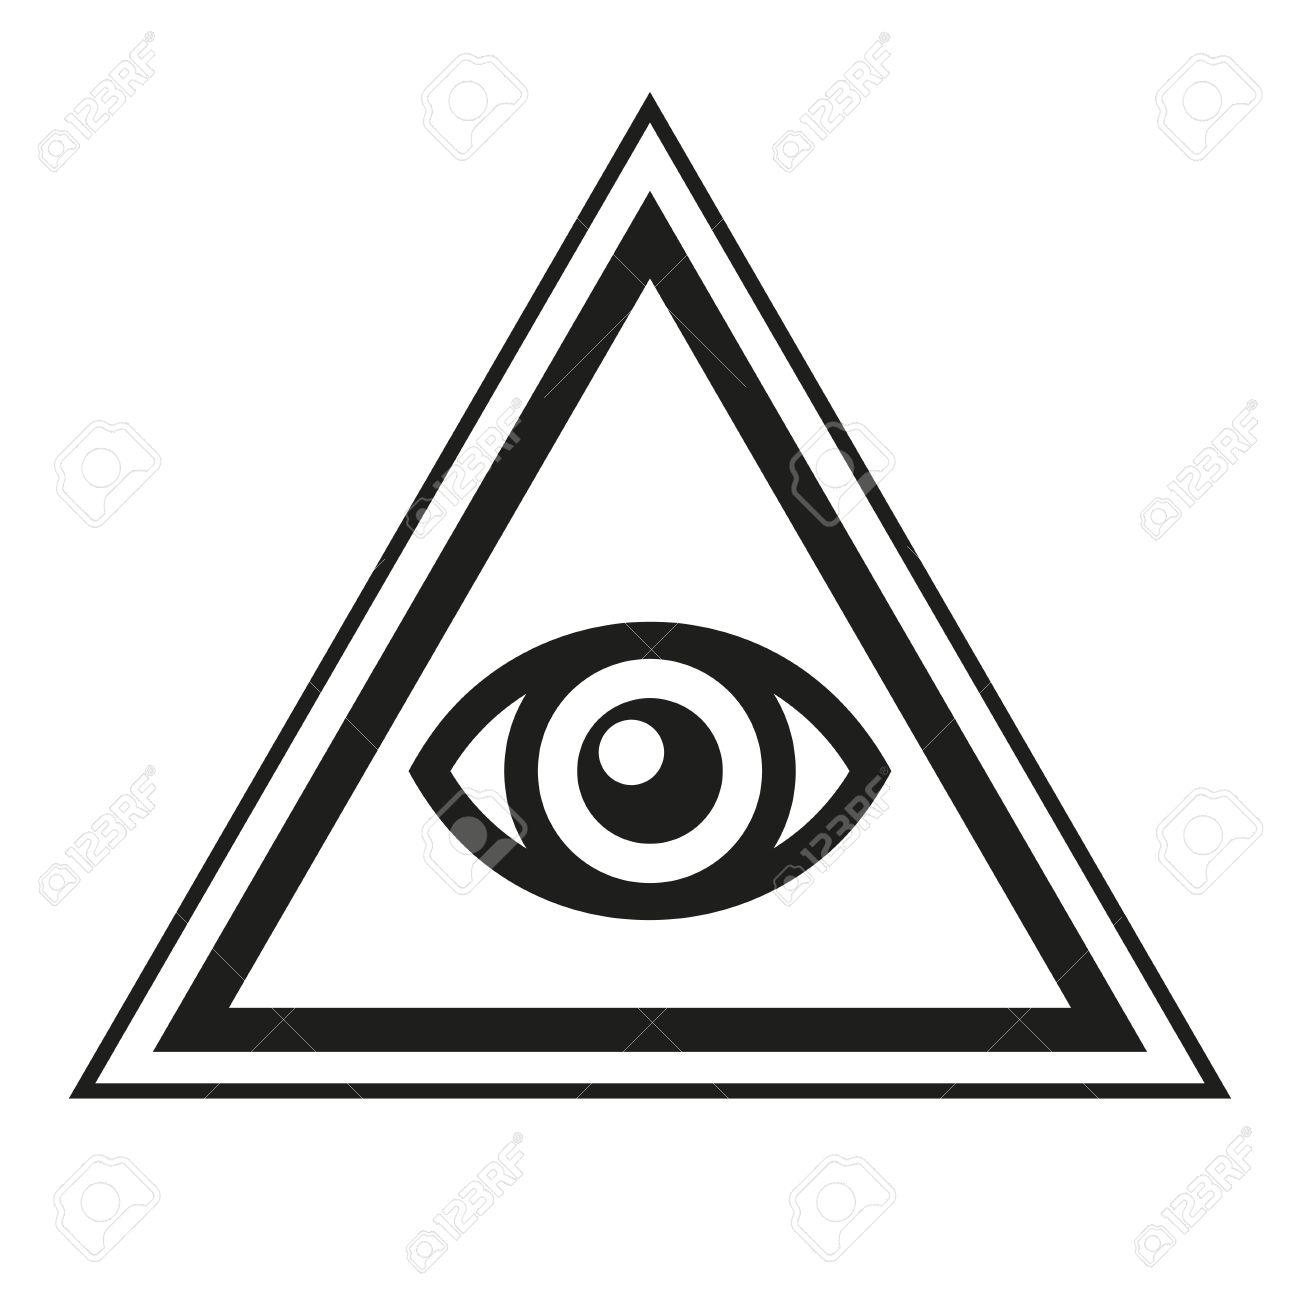 Masonic Symbol All Seeing Eye Inside Pyramid Triangle Icon